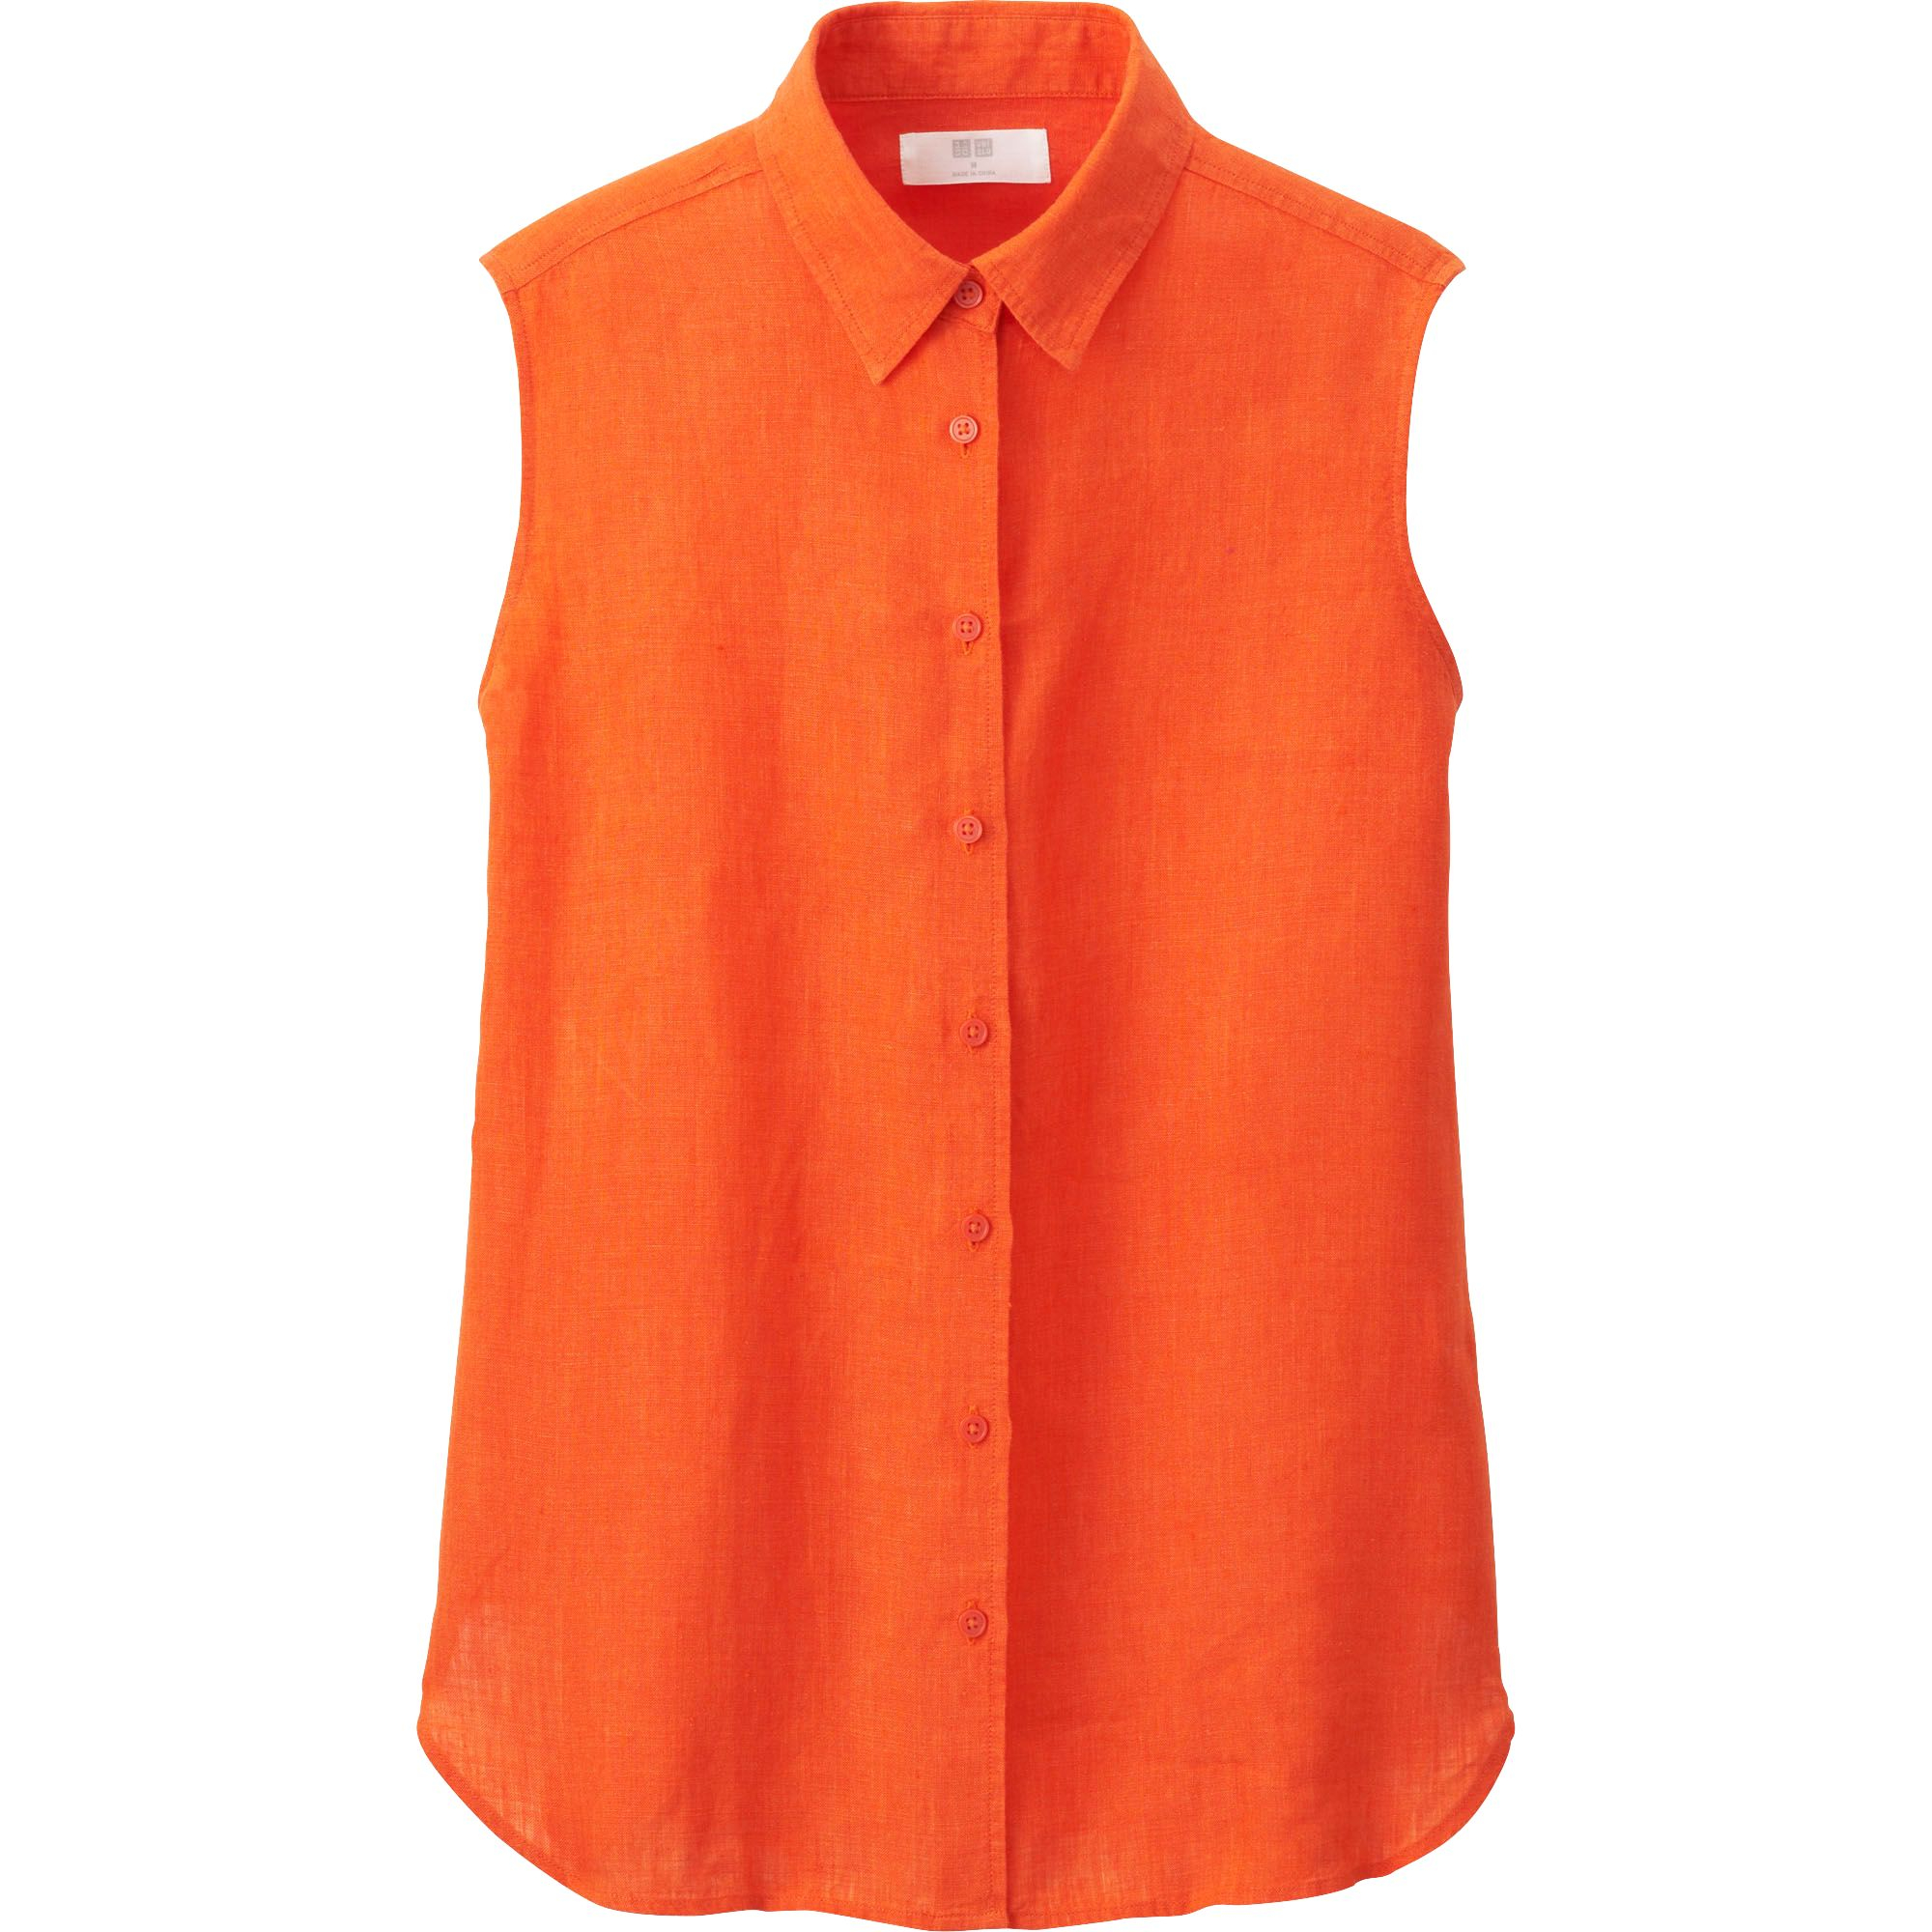 Uniqlo premium linen sleeveless shirt in orange lyst for Uniqlo premium t shirt